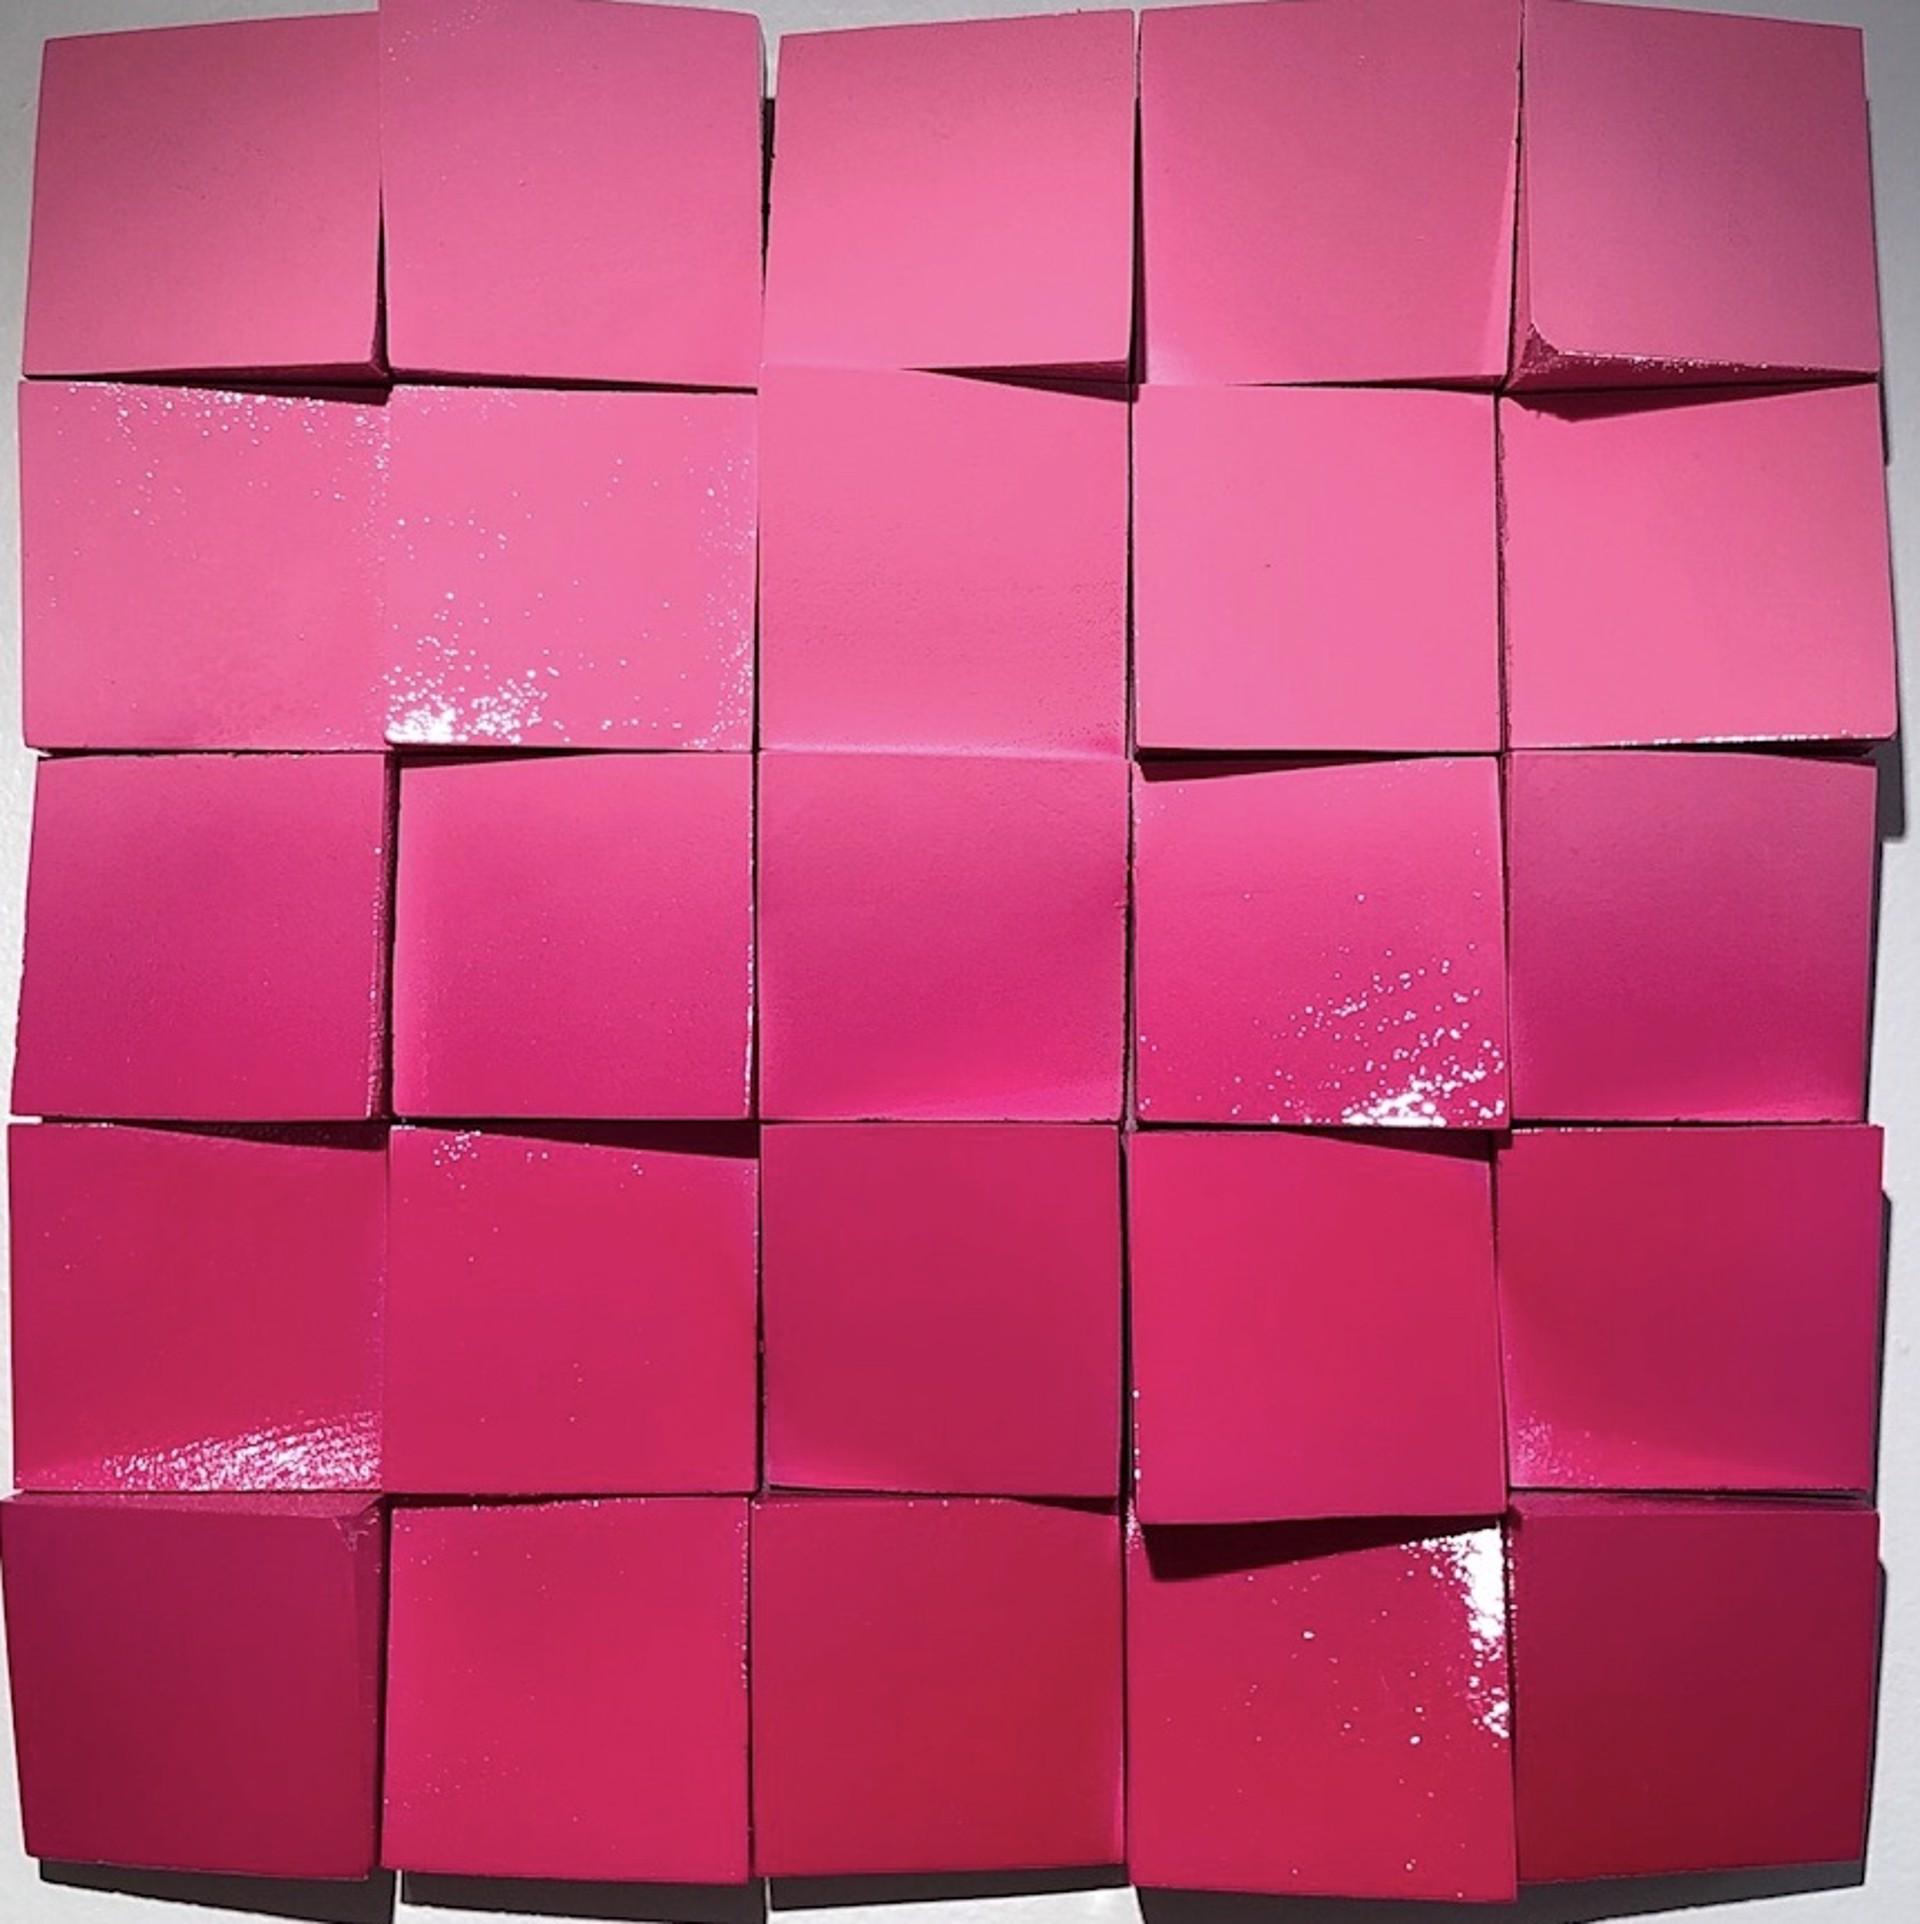 Neon Waves Hot Pink/Pink Ombre by Efi Mashiah